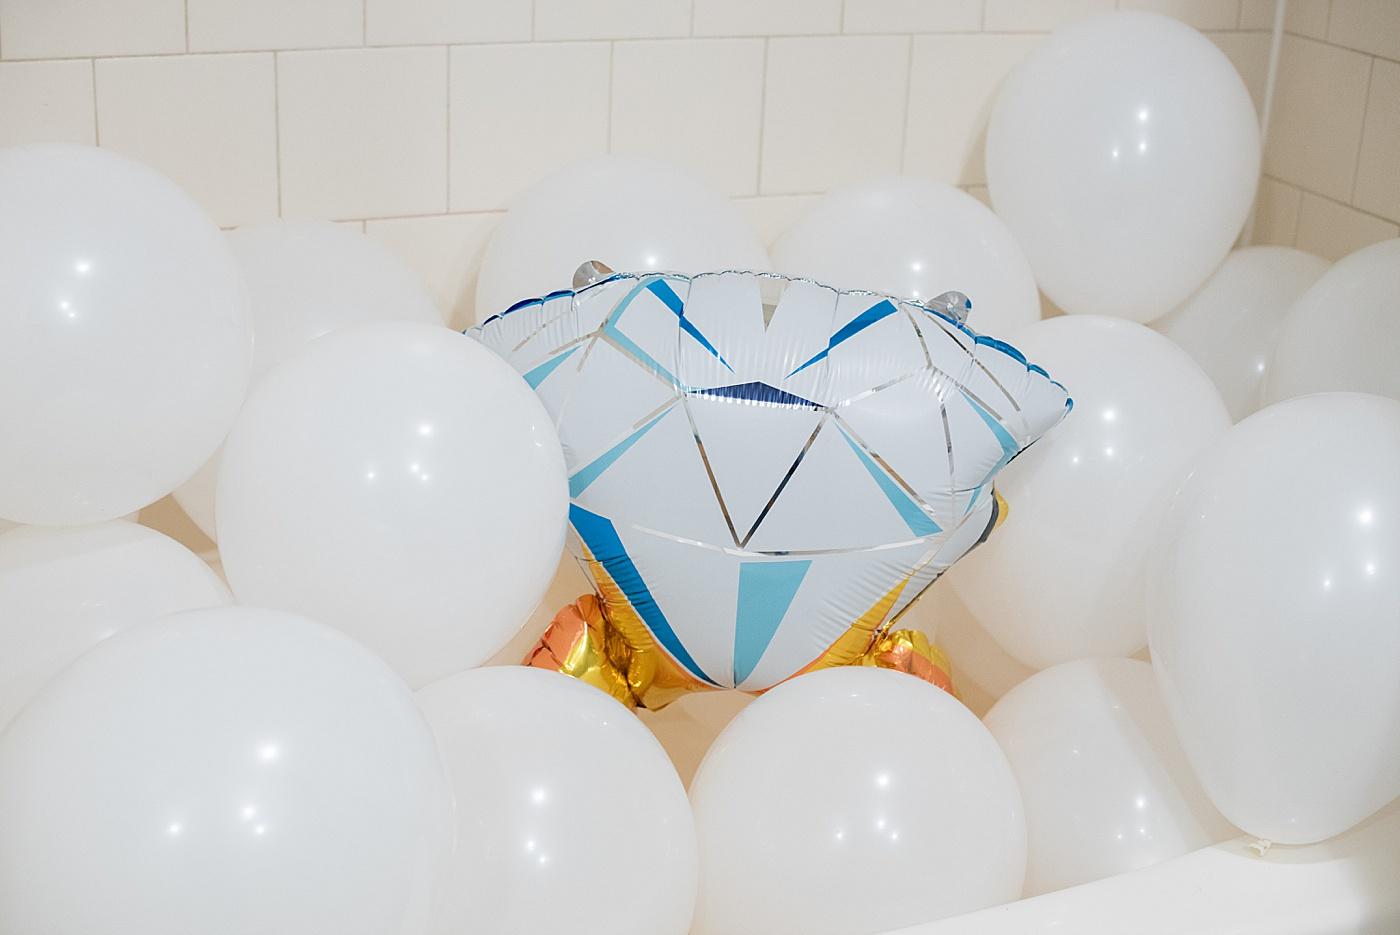 Mikkel Paige Photography, proposal balloons from her husband, Dan. #MikkelPaige #ProposalIdeas